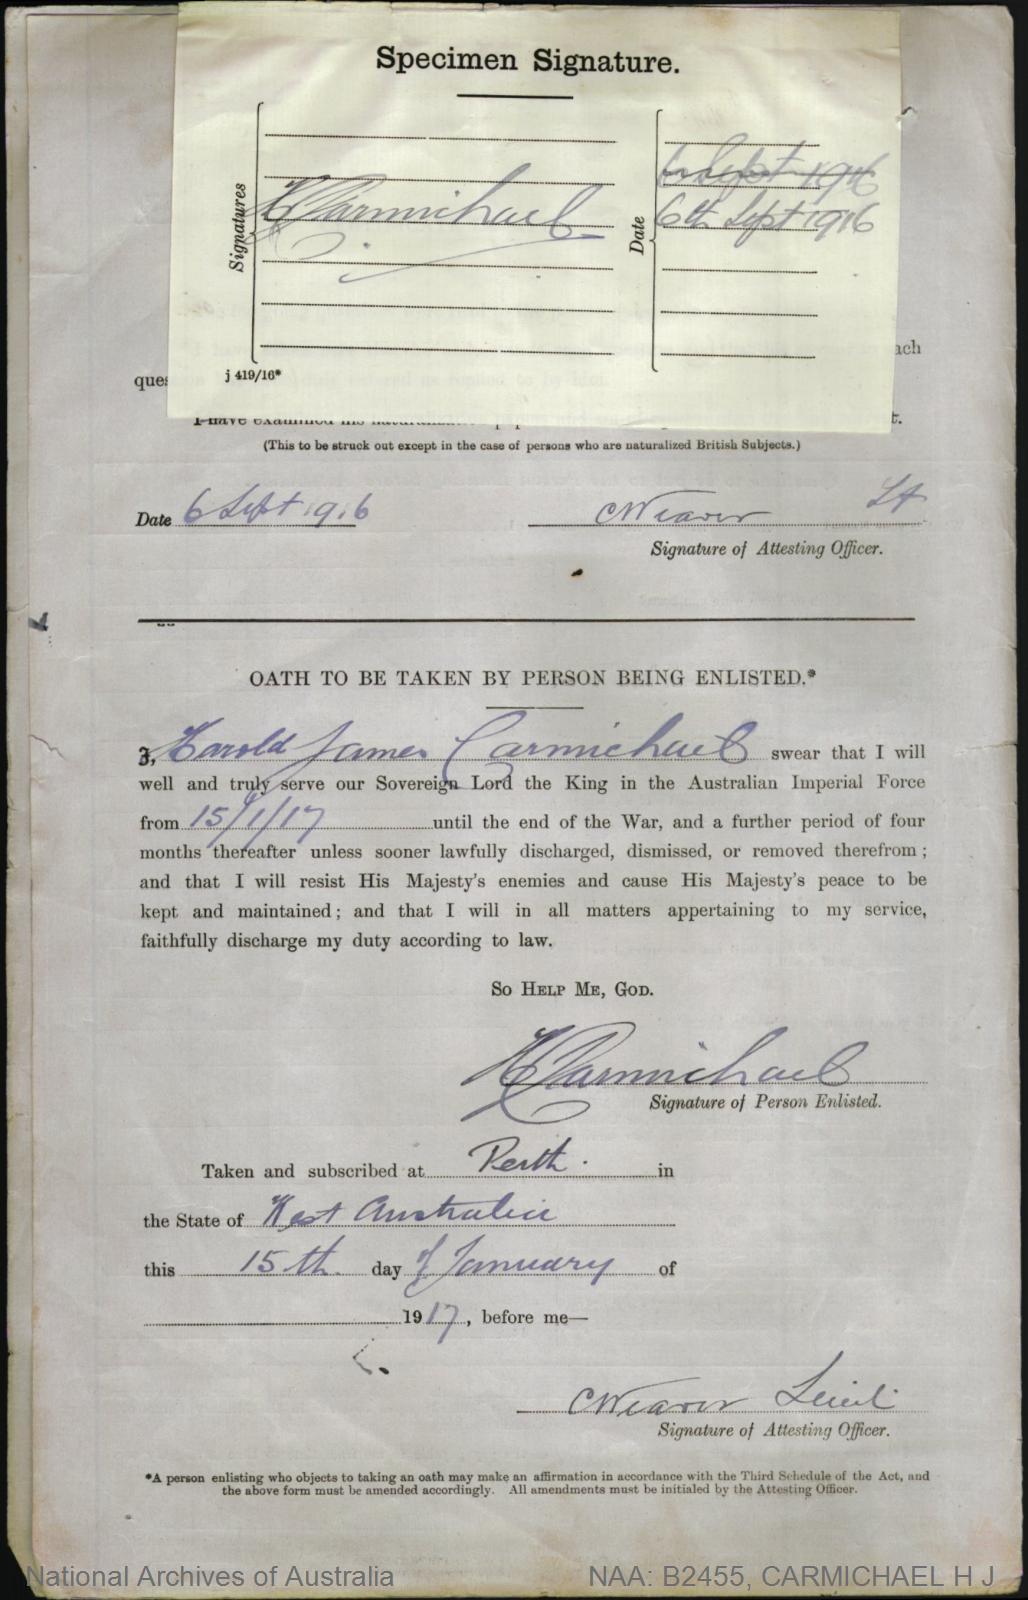 Carmichael Harold James : SERN 18256 : POB Perth WA : POE Perth WA : NOK M Carmichael Rebecca